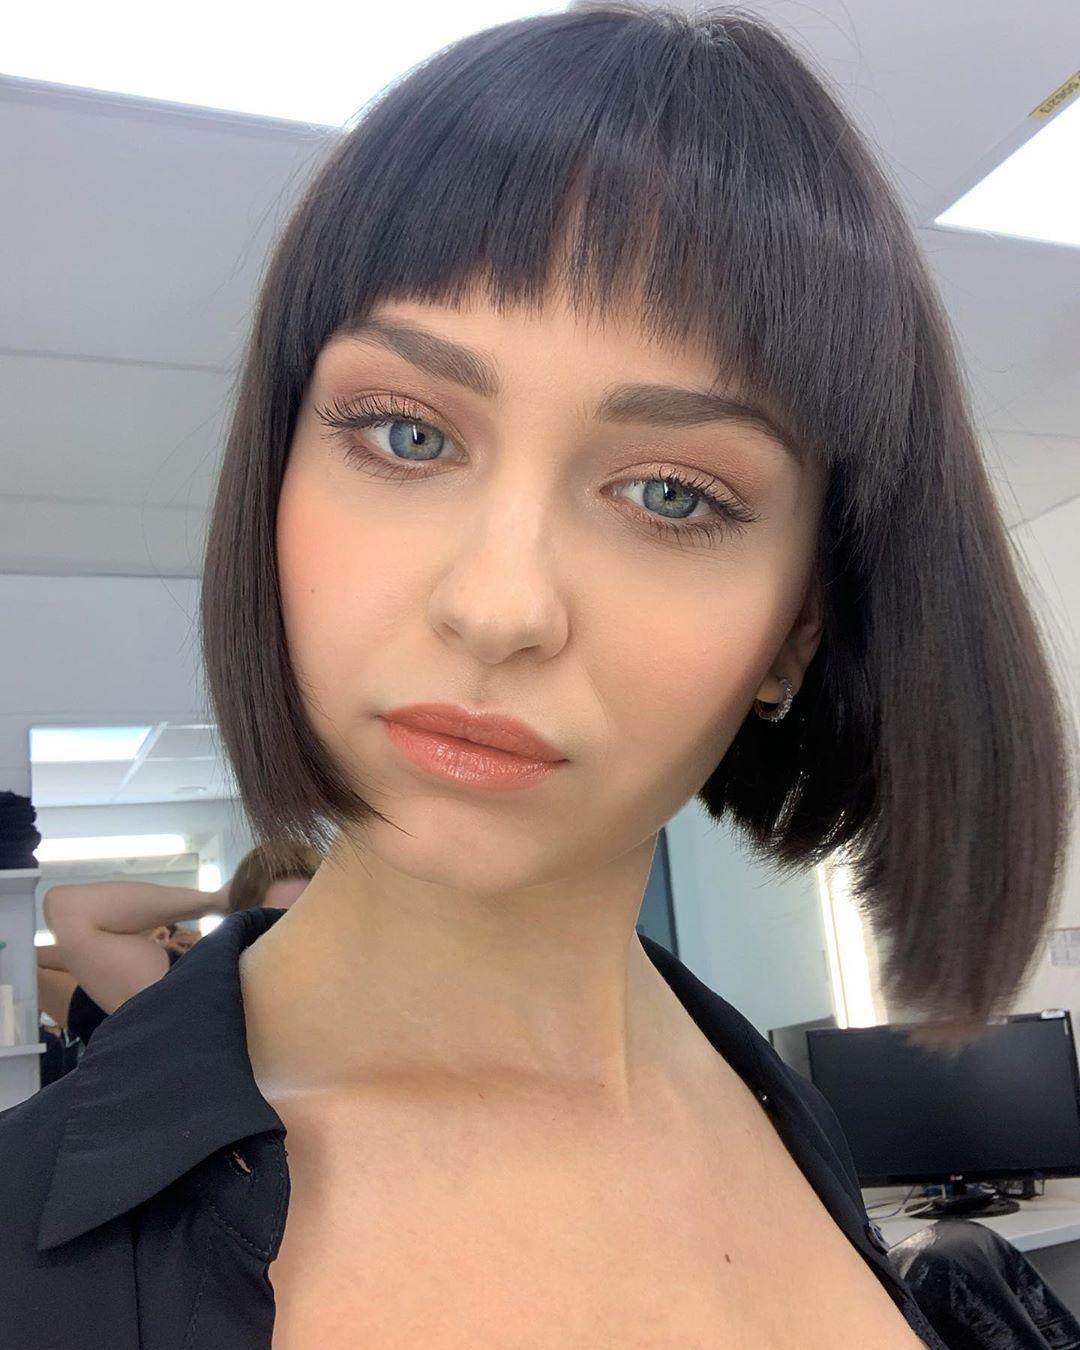 Gefallt 65 7 Tsd Mal 328 Kommentare Anastasia Anastasia Gntm2020 Official Auf Instagram Professional In 2020 Gntm Models Gntm Germanys Next Topmodel